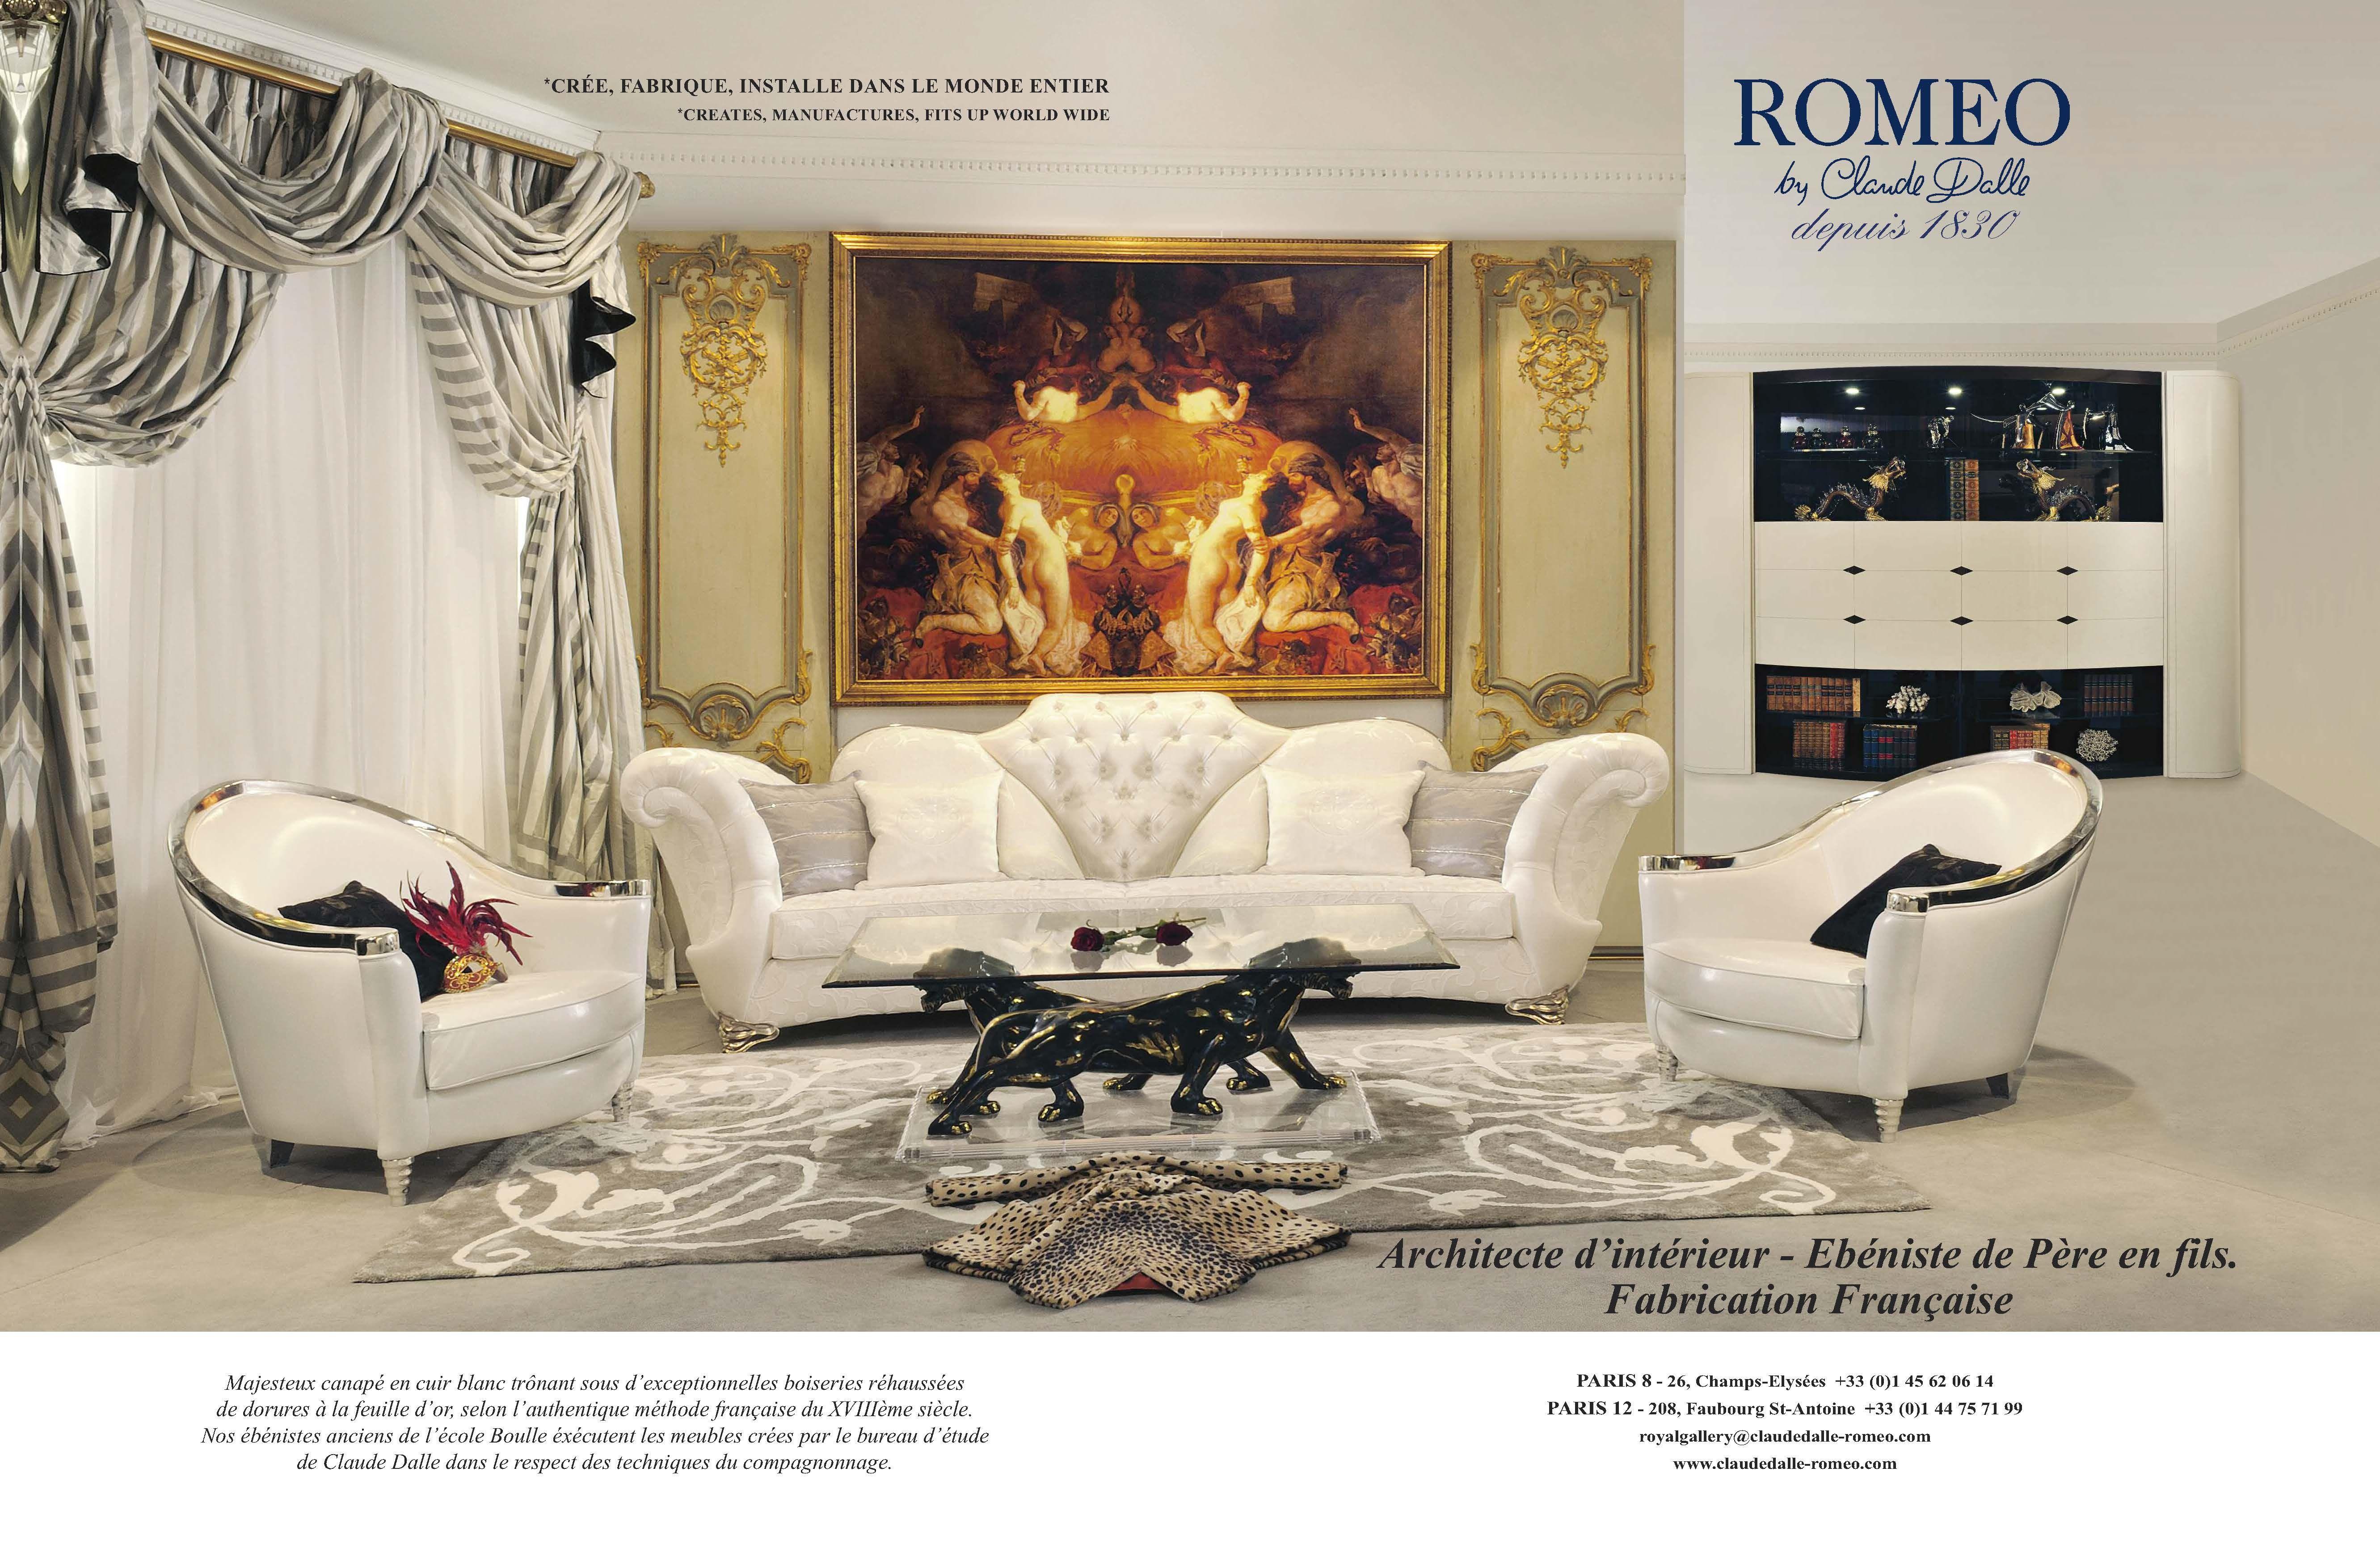 Romeo Shooting Fashion Prestigeinternational Luxuryfurnitures Interiordesign Architectureinterieure Corinnesananes Furniture Interior Design Home